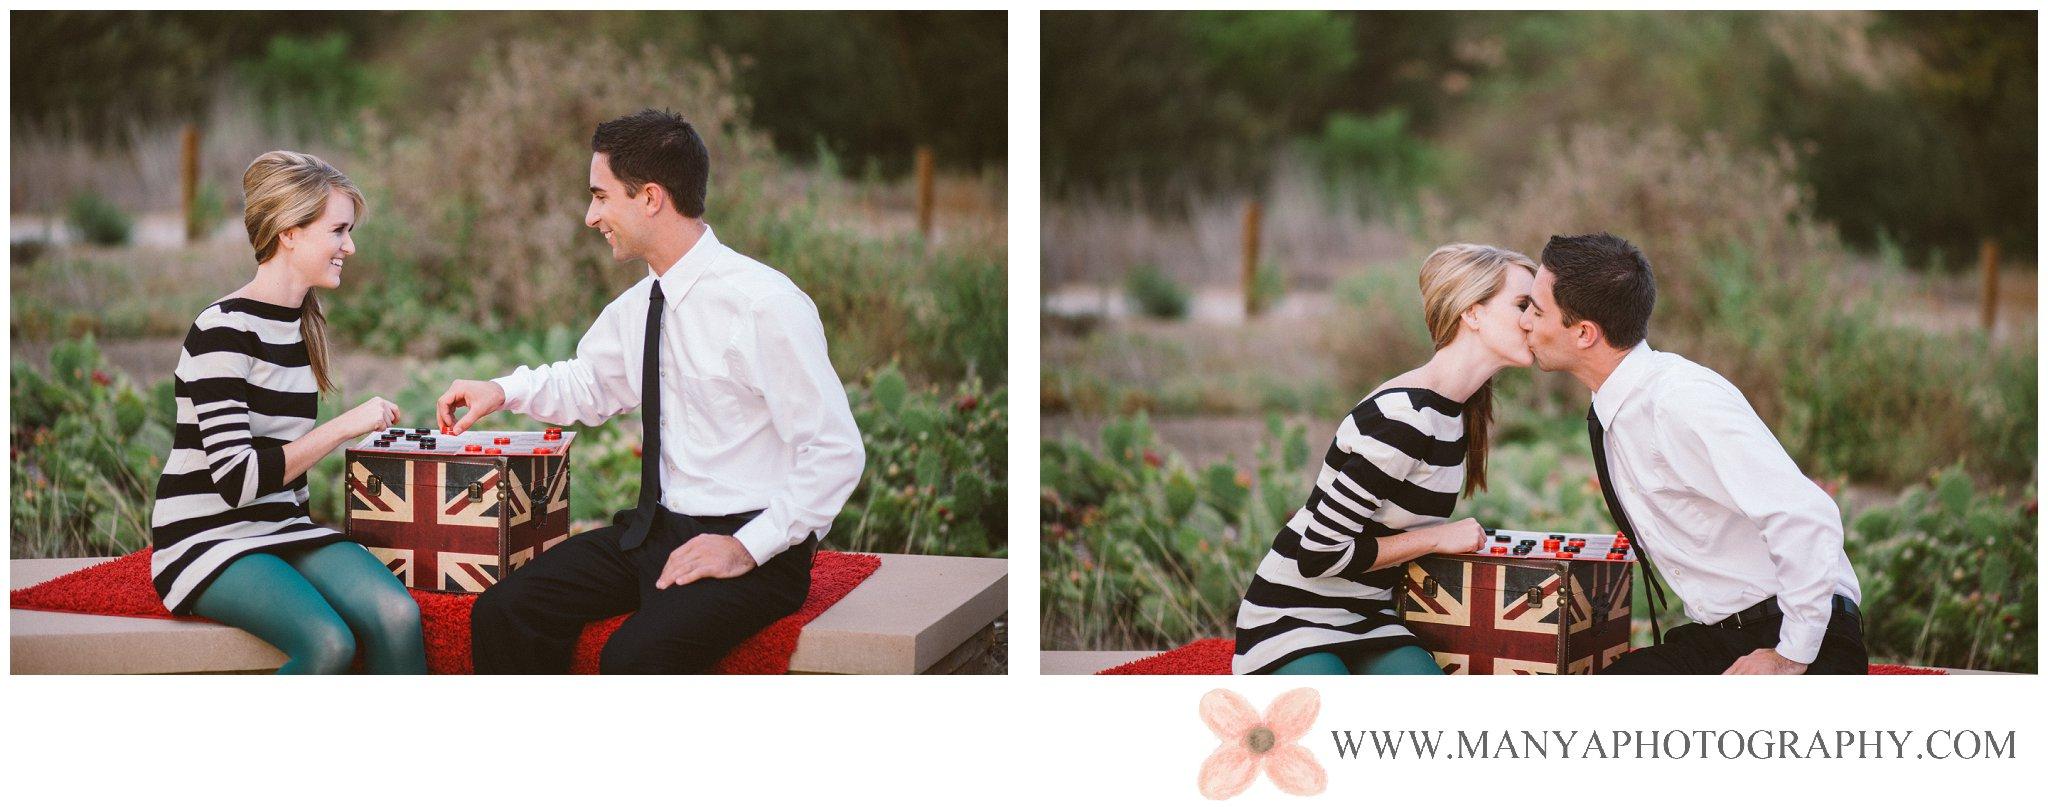 2013-10-17_0038 - Orange County Wedding Photographer